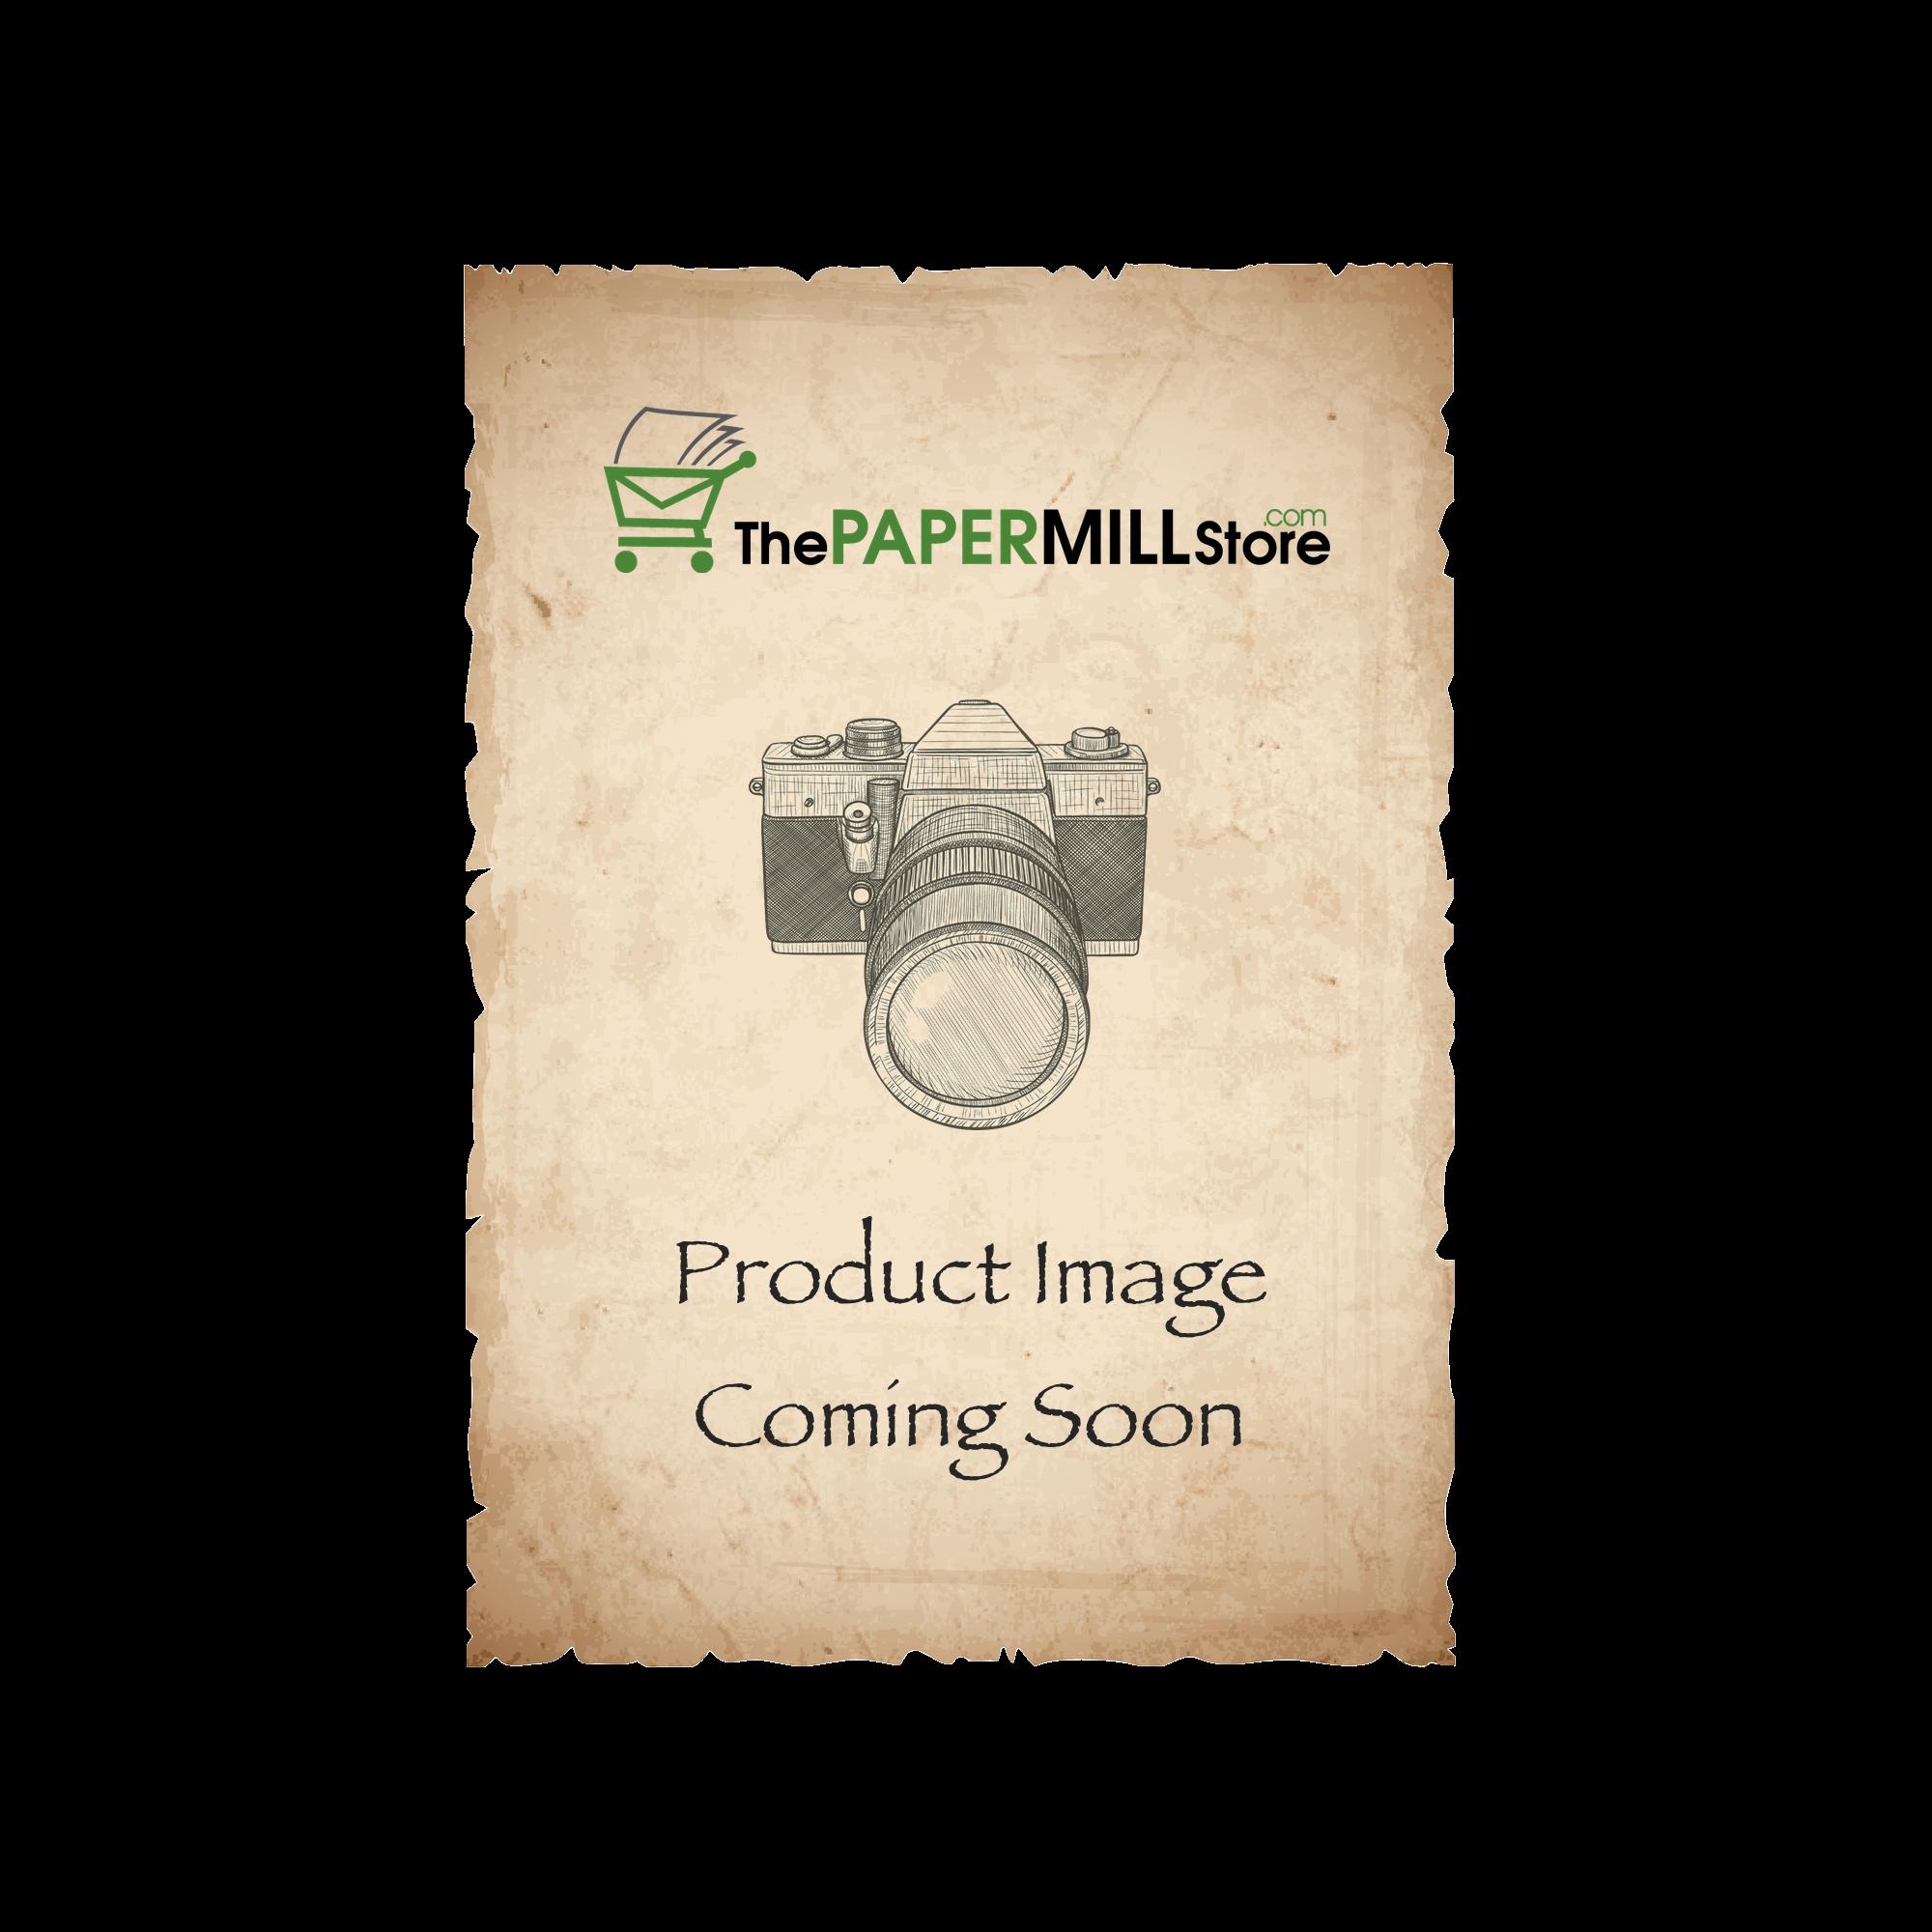 SuperFine Ultrawhite Envelopes - A7 (5 1/4 x 7 1/4) 70 lb Text Eggshell 250 per Box